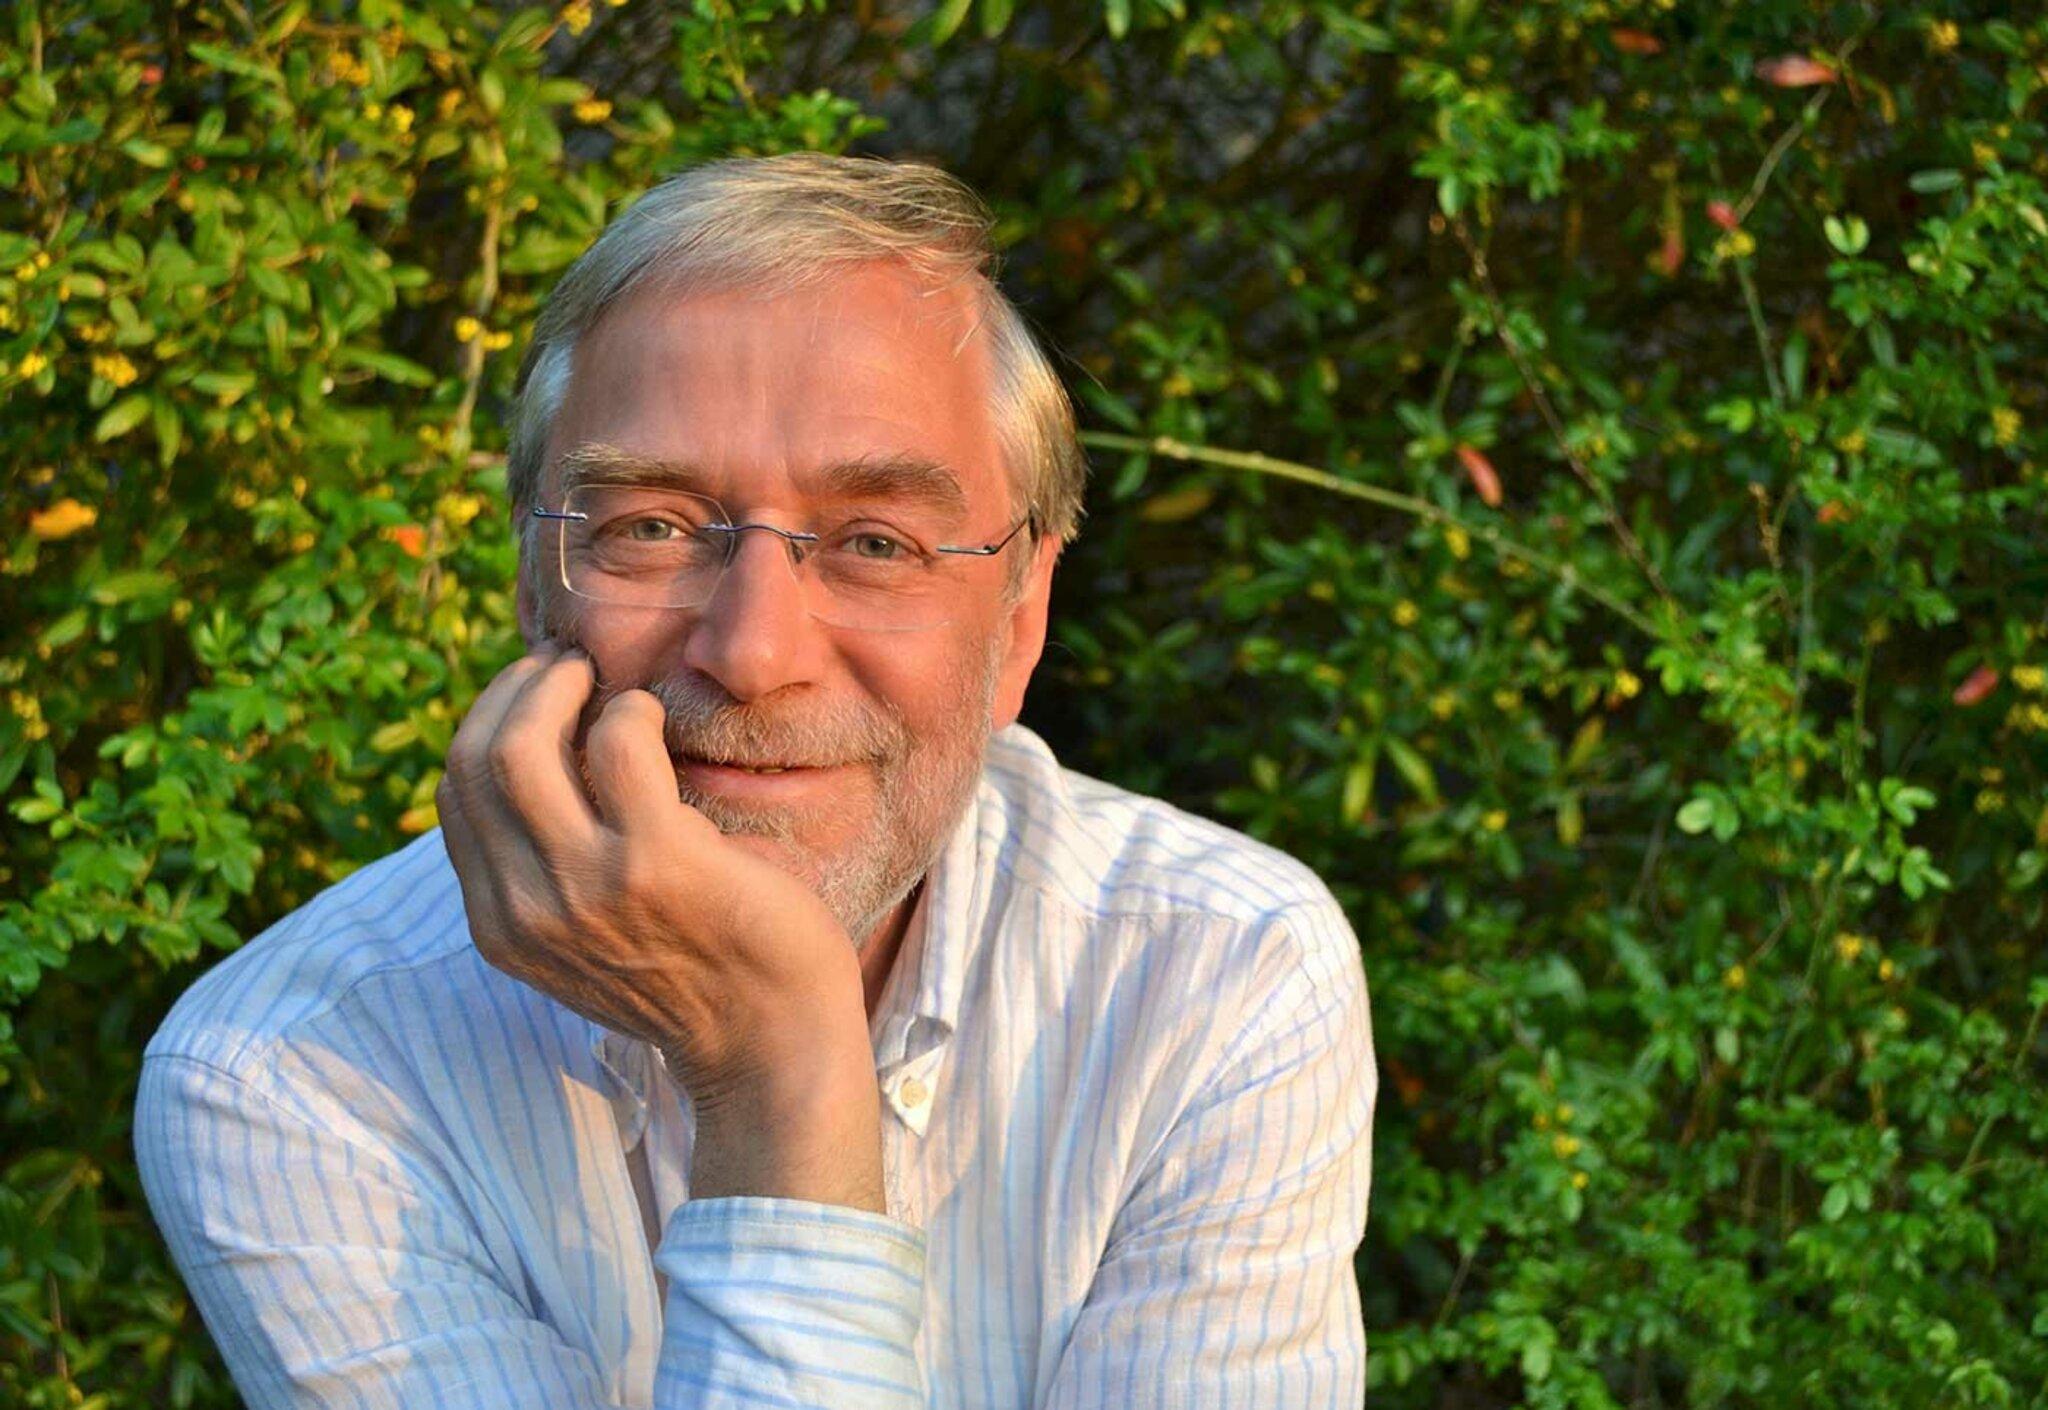 Gehirnforscher Gerald Hüther